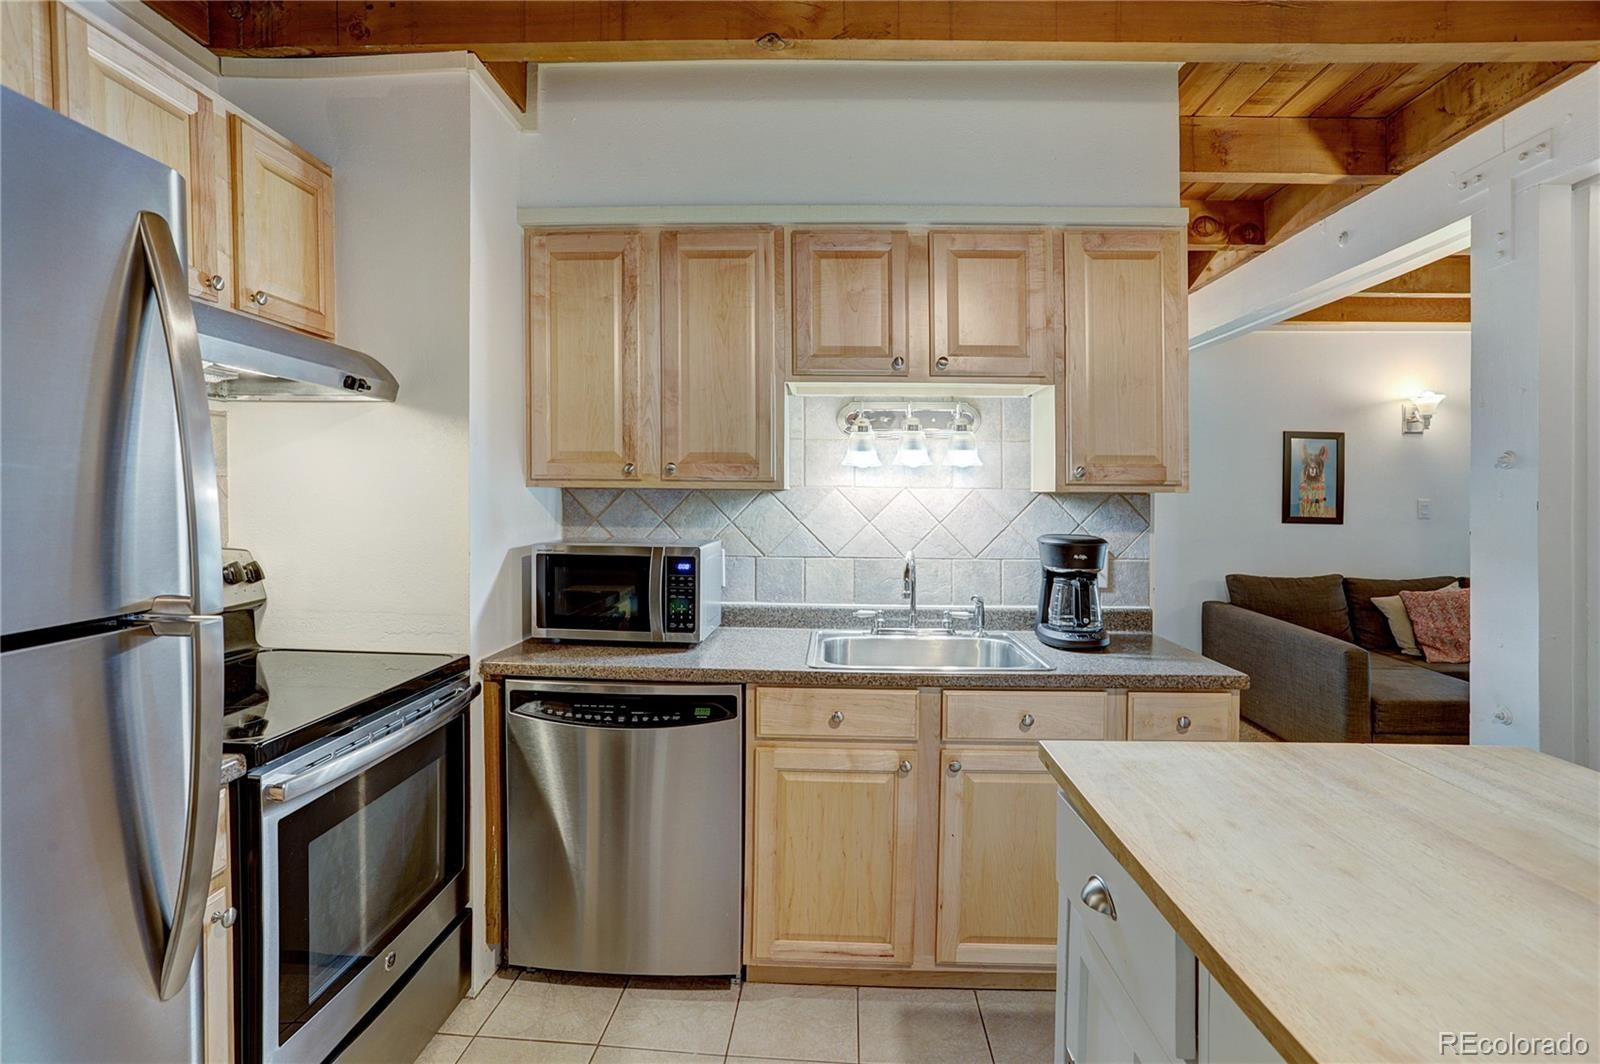 MLS# 3104503 - 10 - 2400 Lodge Pole Circle #206, Silverthorne, CO 80498